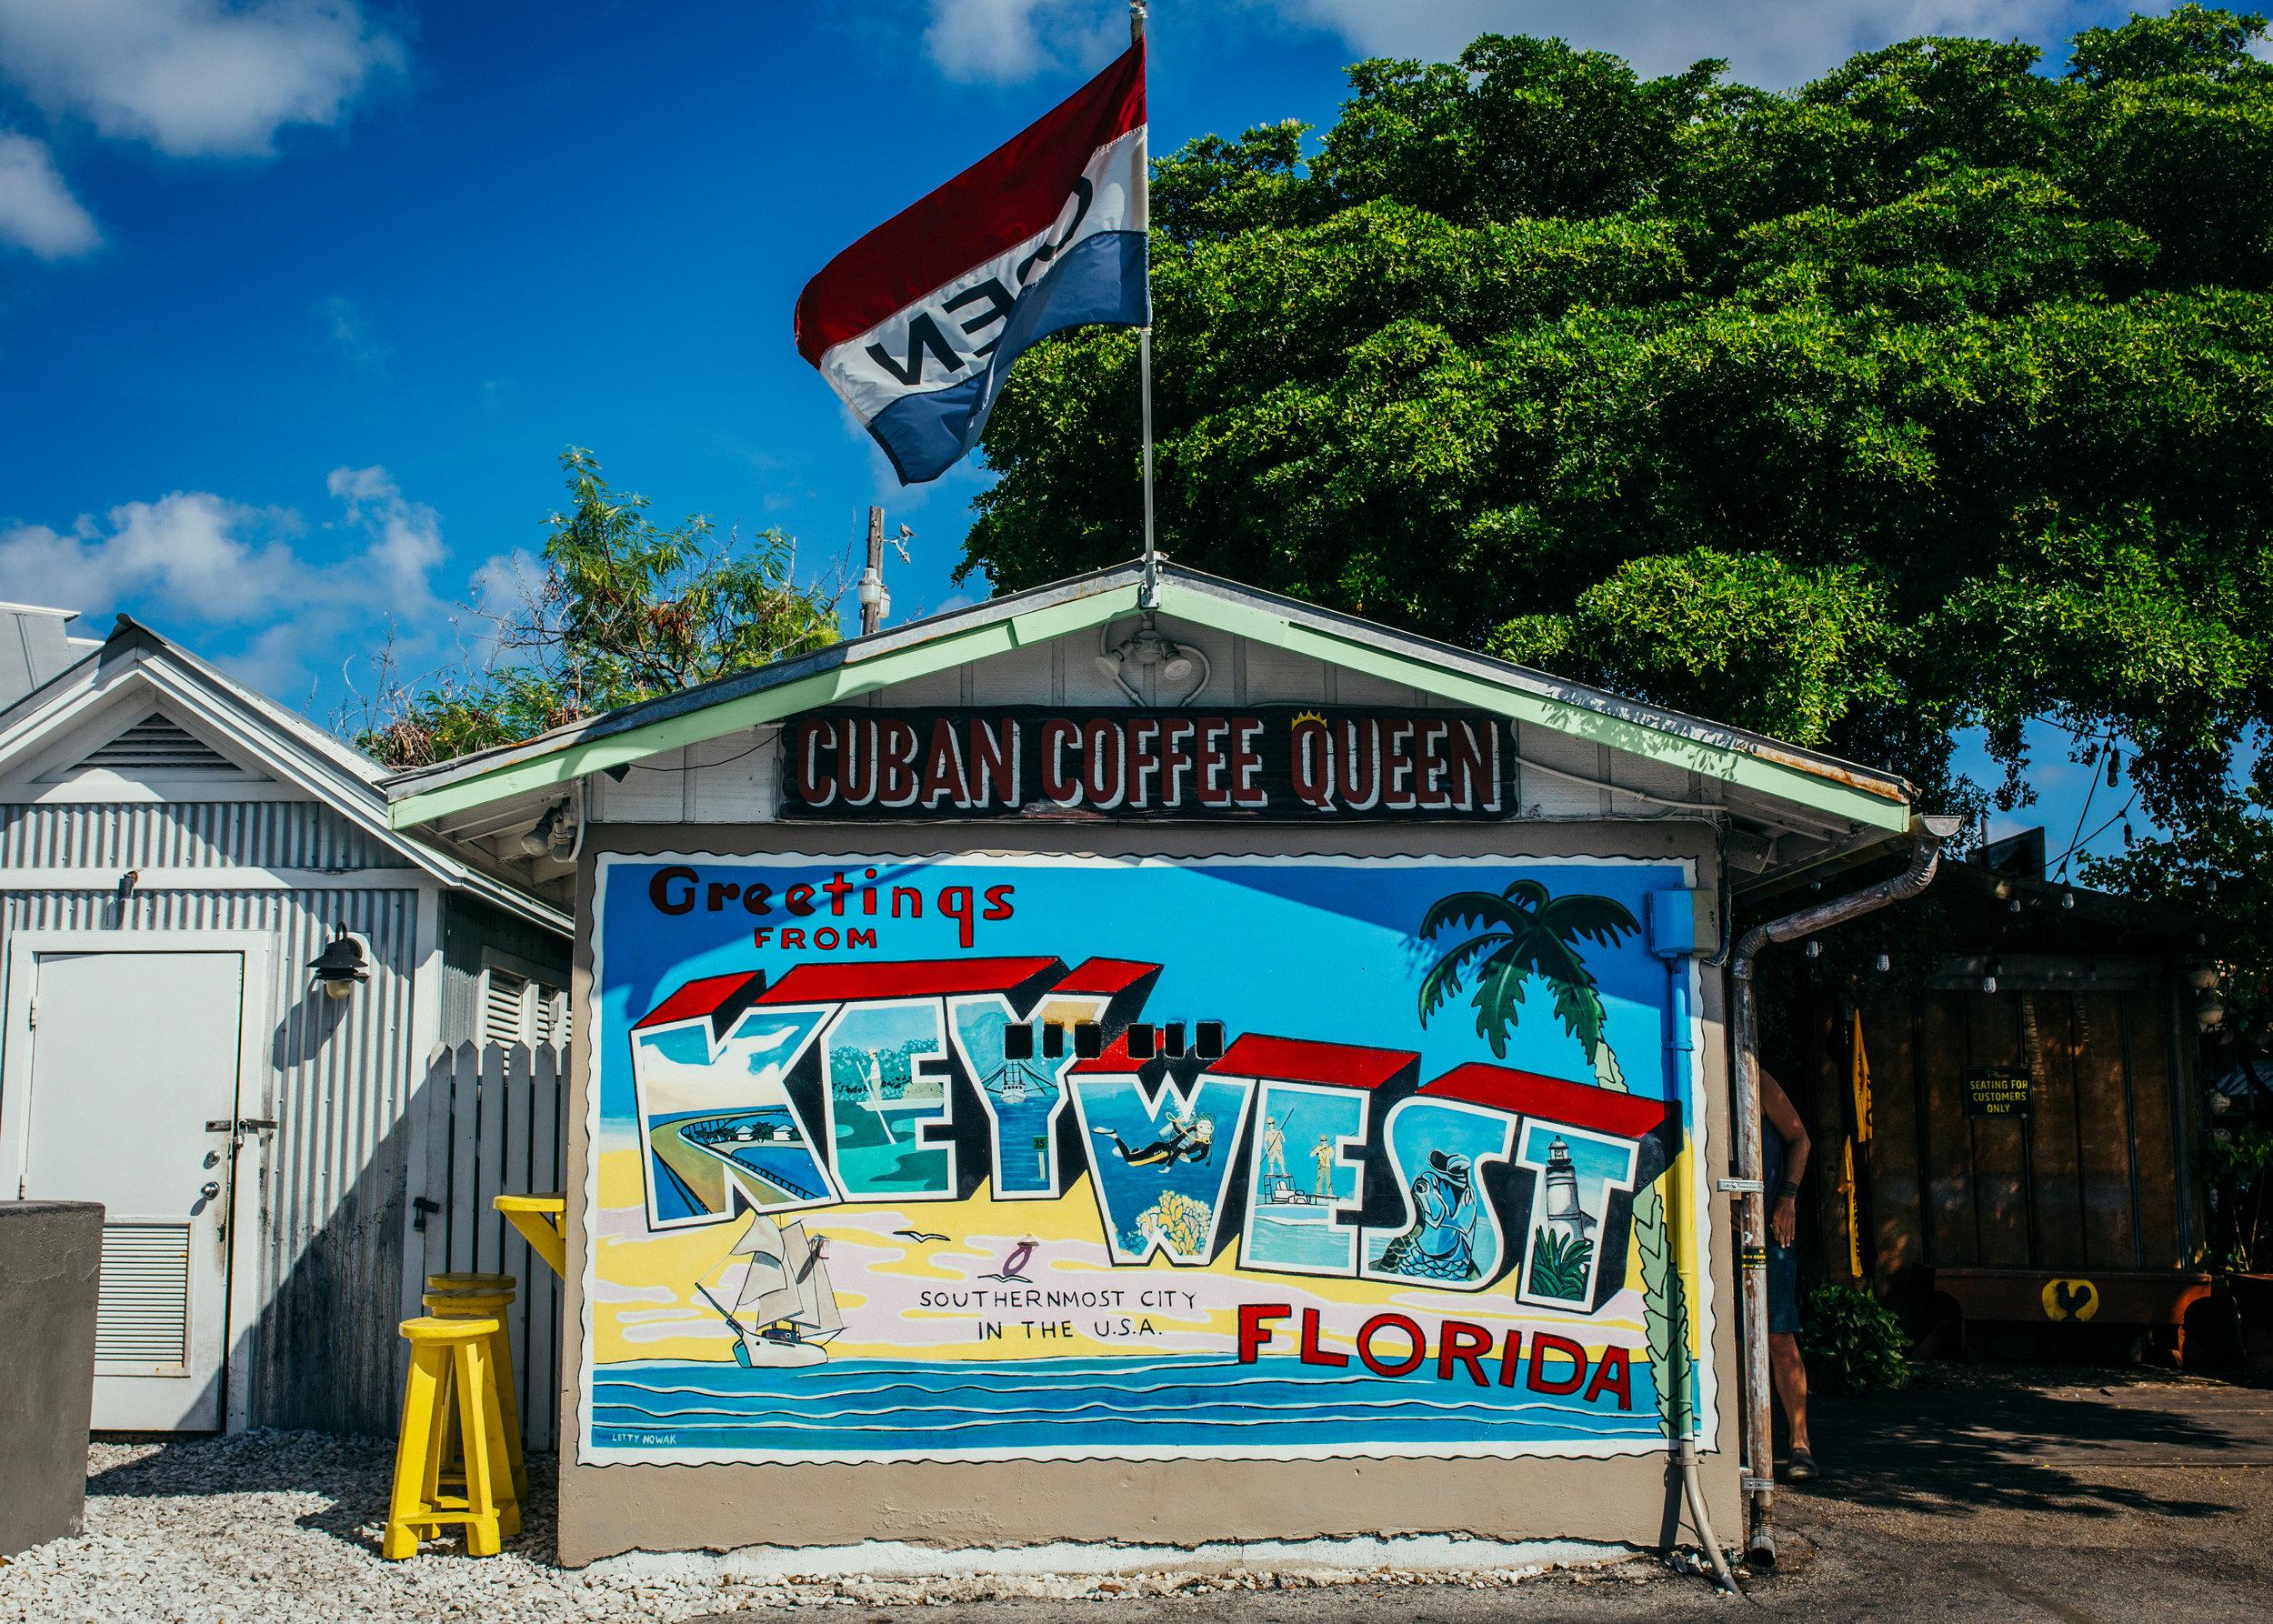 blog key west lena perkins, cuban coffee queen, postcard mural.jpg